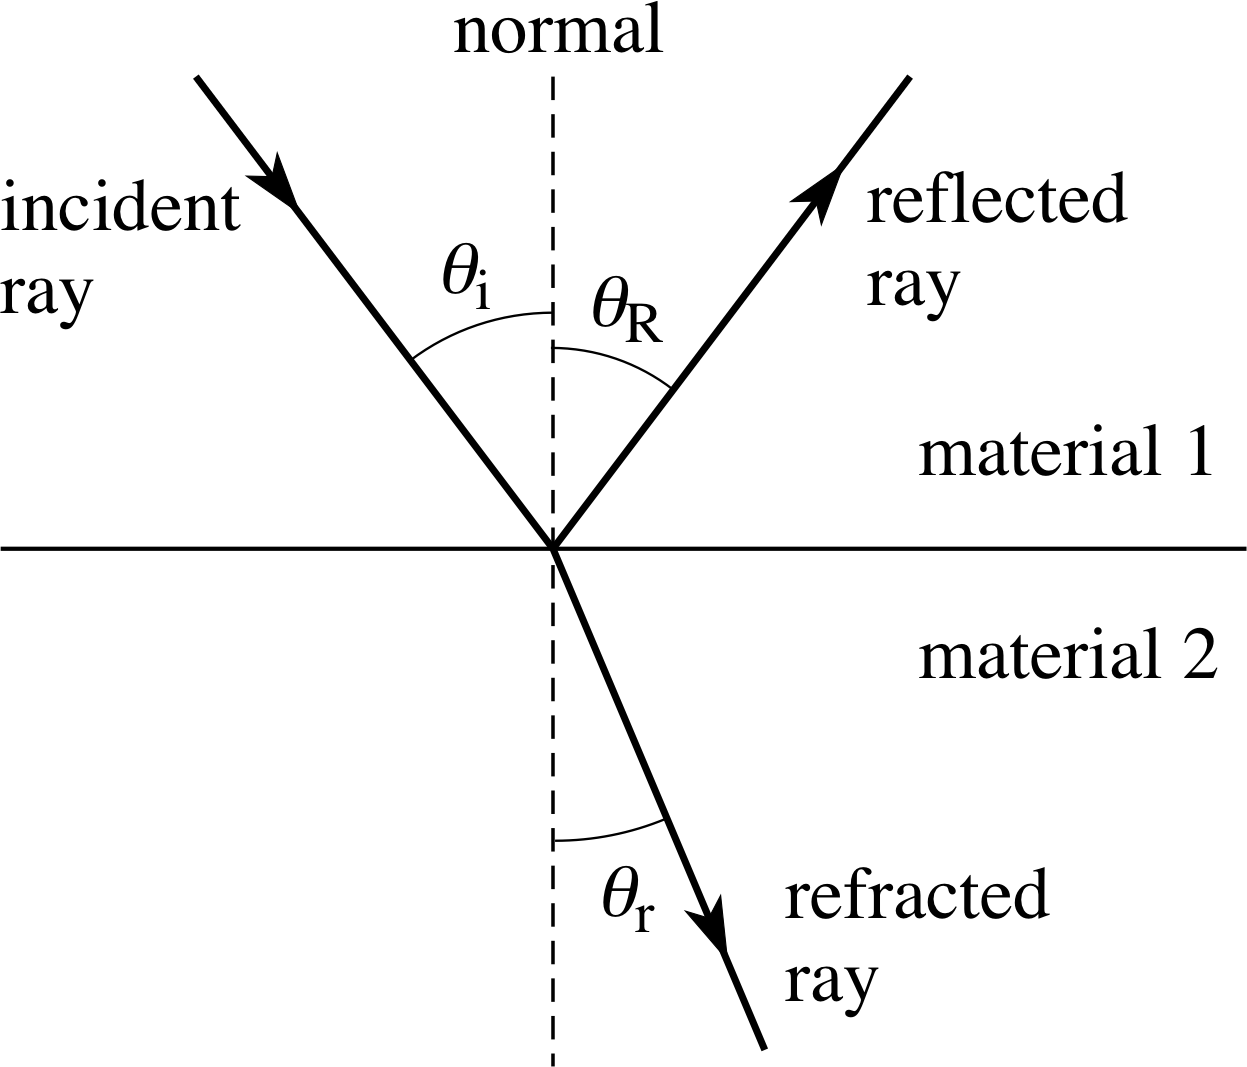 Pplato flap phys 62 rays and geometrical optics figure 7 reflection pooptronica